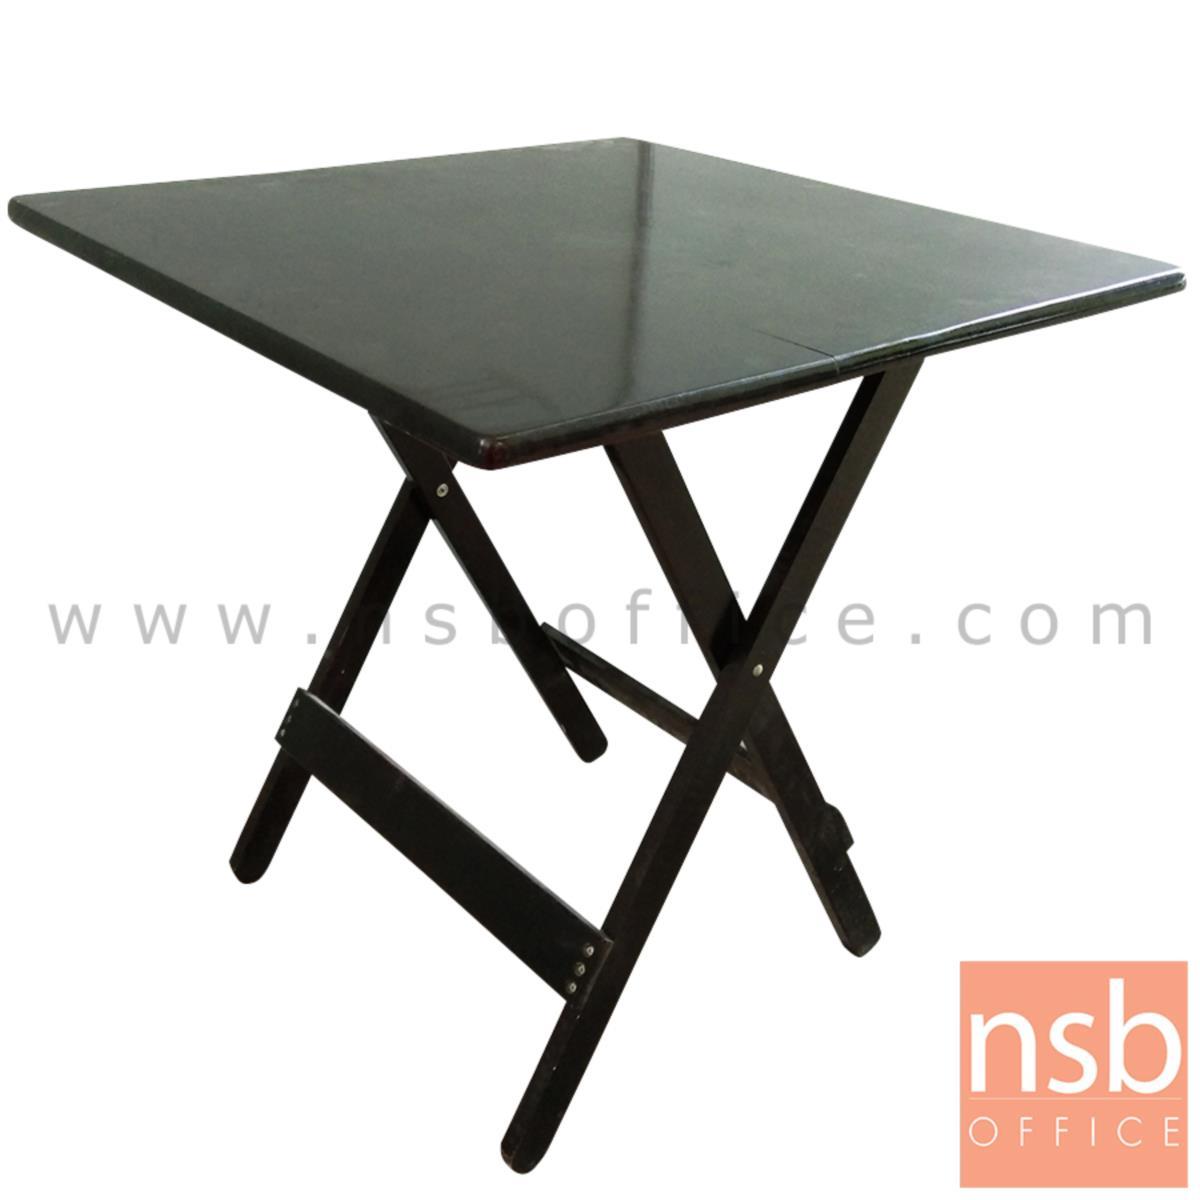 A14A194:โต๊ะพับไม้ยางพารา รุ่น Zinnia (ซินเนียร์) ขนาด 60W ,75W cm. ขาไม้